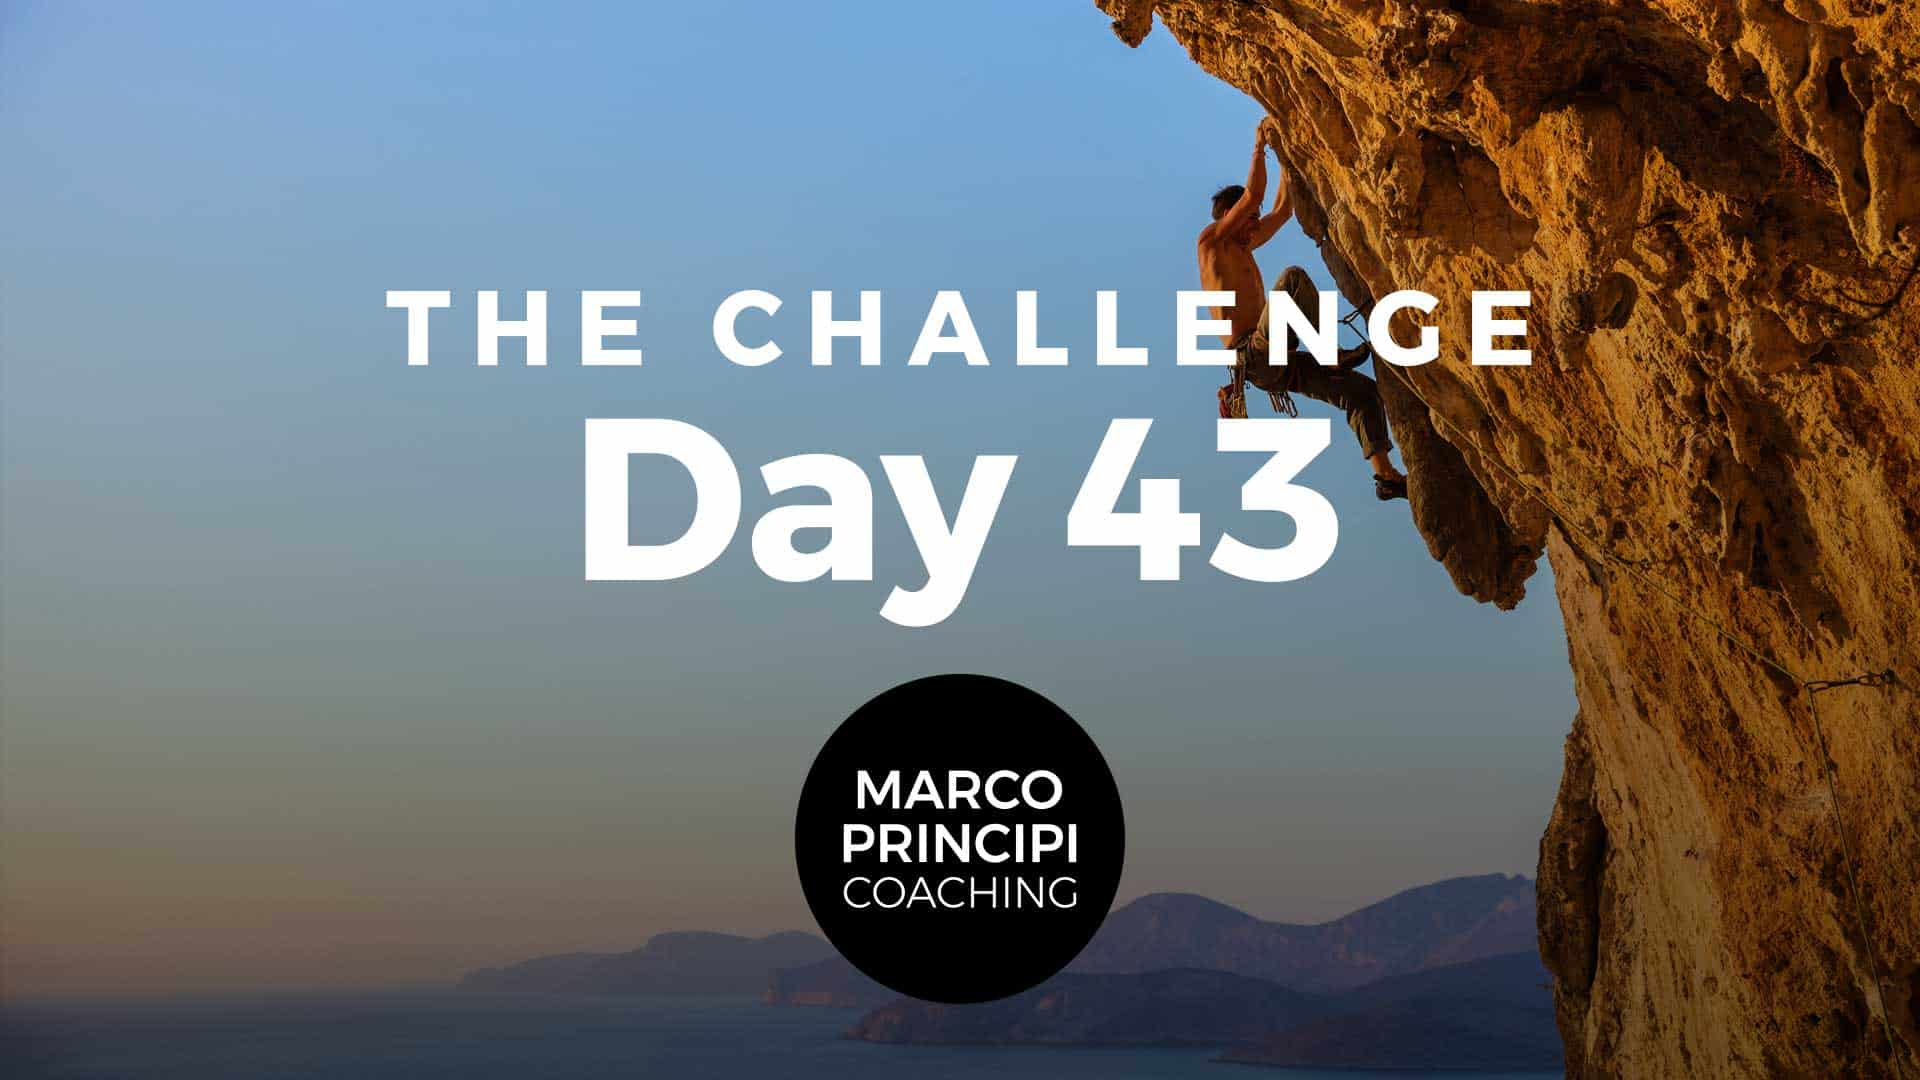 Marco Principi The Challenge Day 43